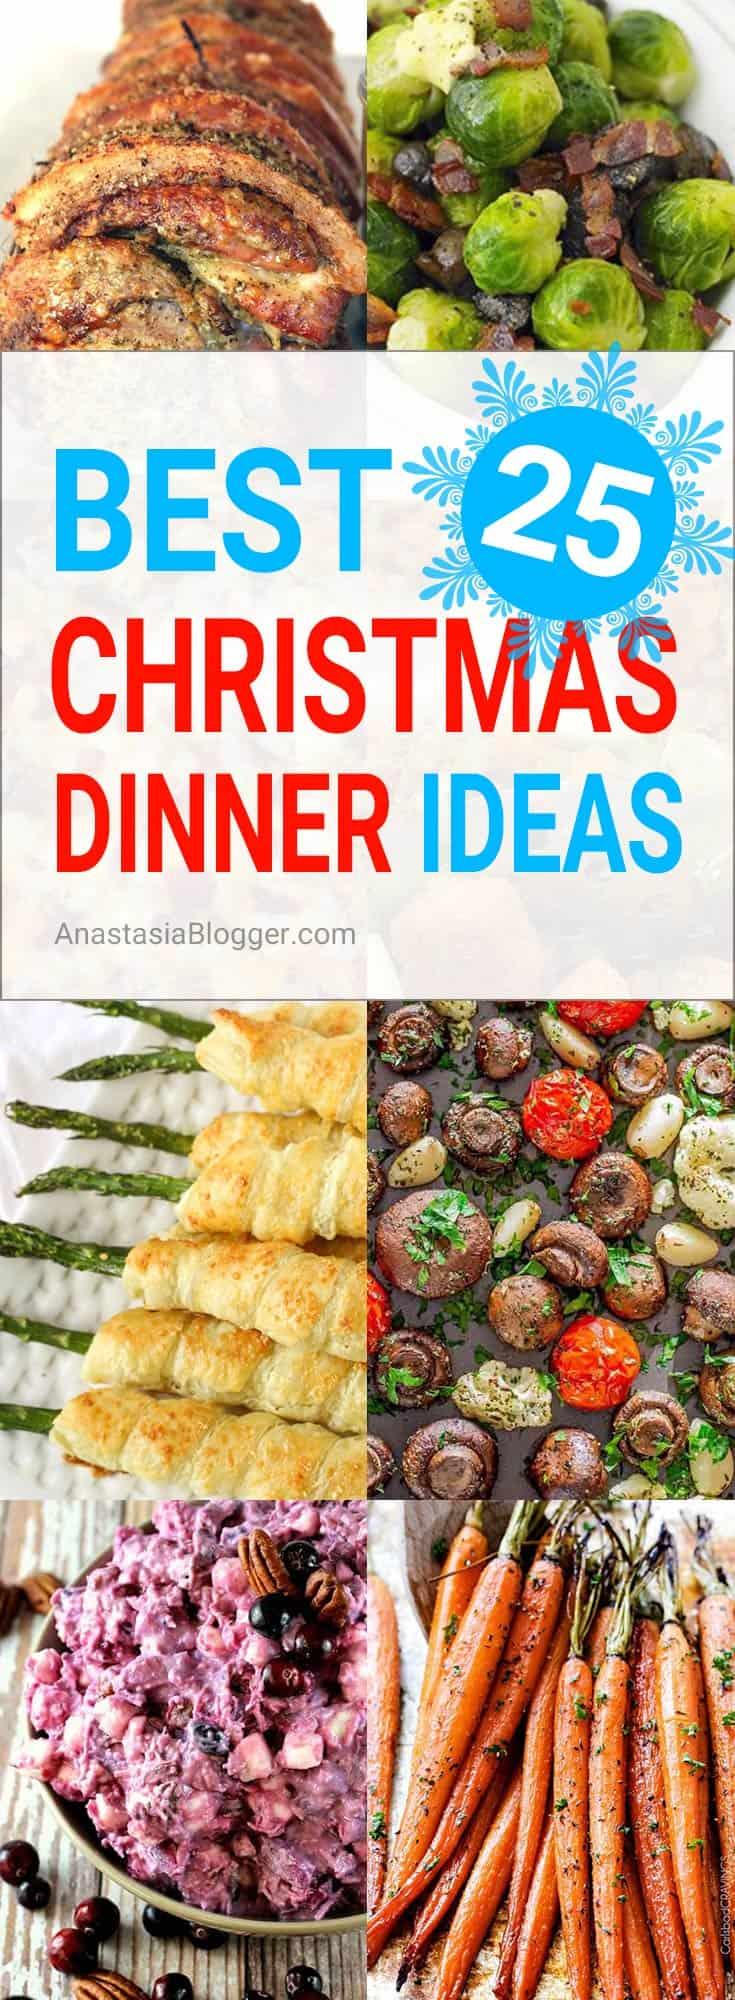 Southern Christmas Dinner Menu Ideas.Food Appetizer Recipes South Dish Southern Christmas Dinner